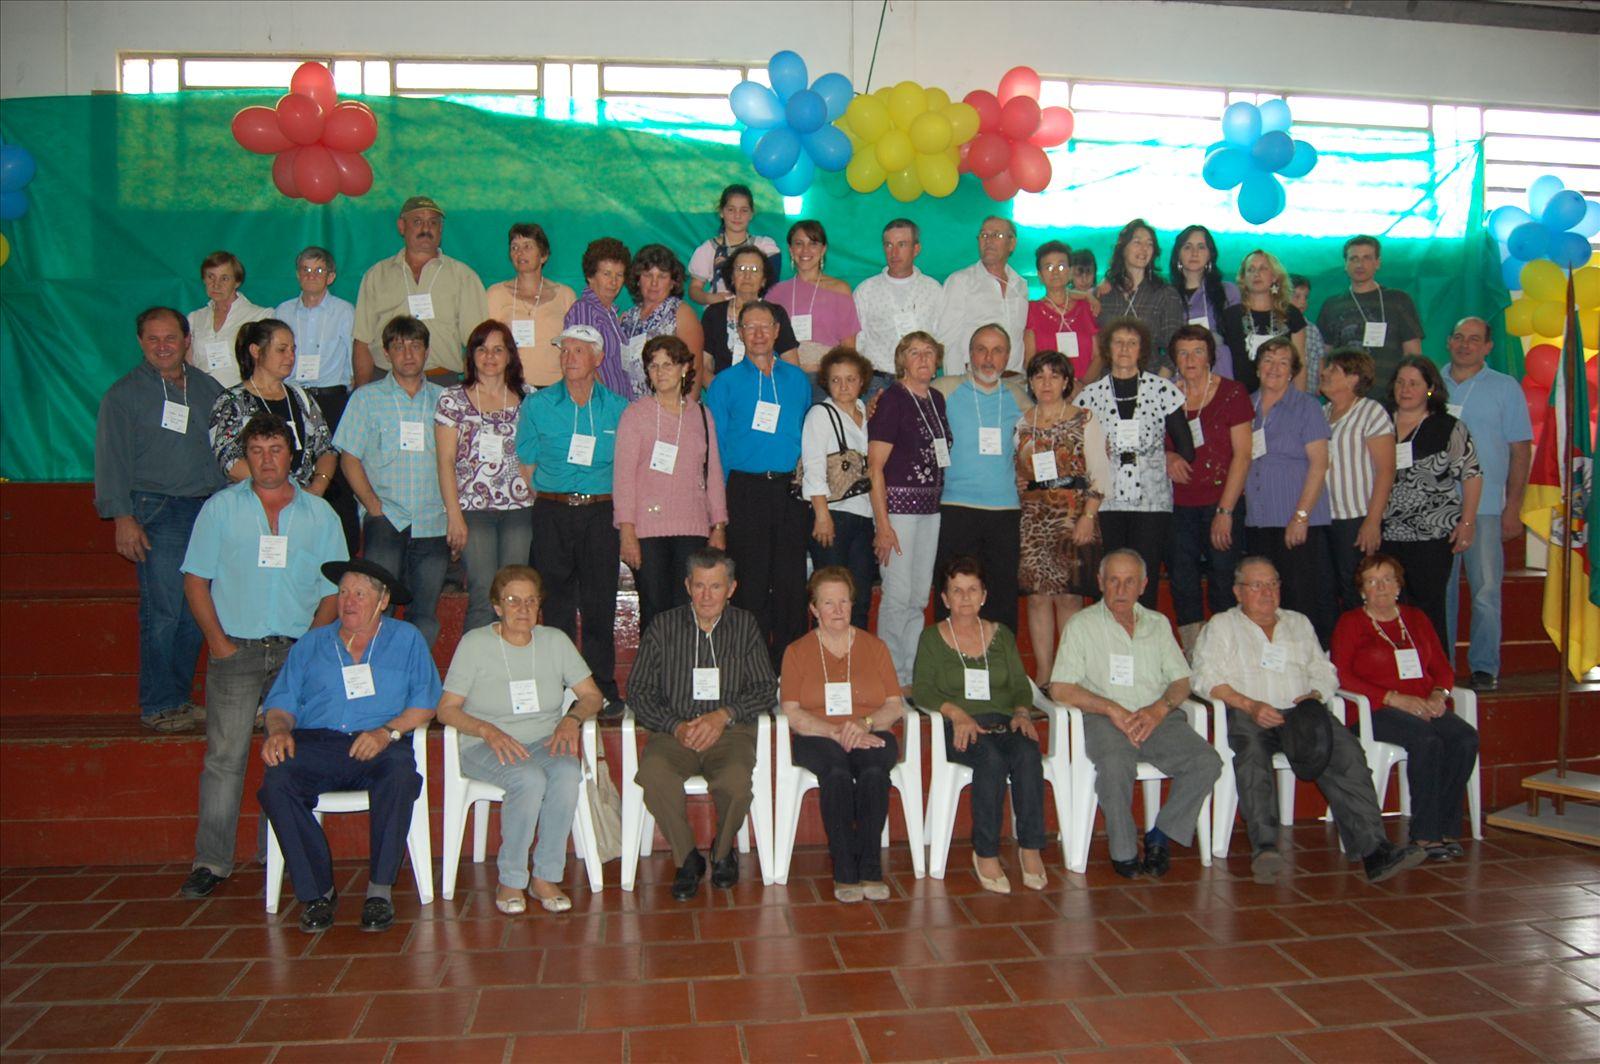 2º Encontro Família Cornelli - 11.10.2009 (181)_0